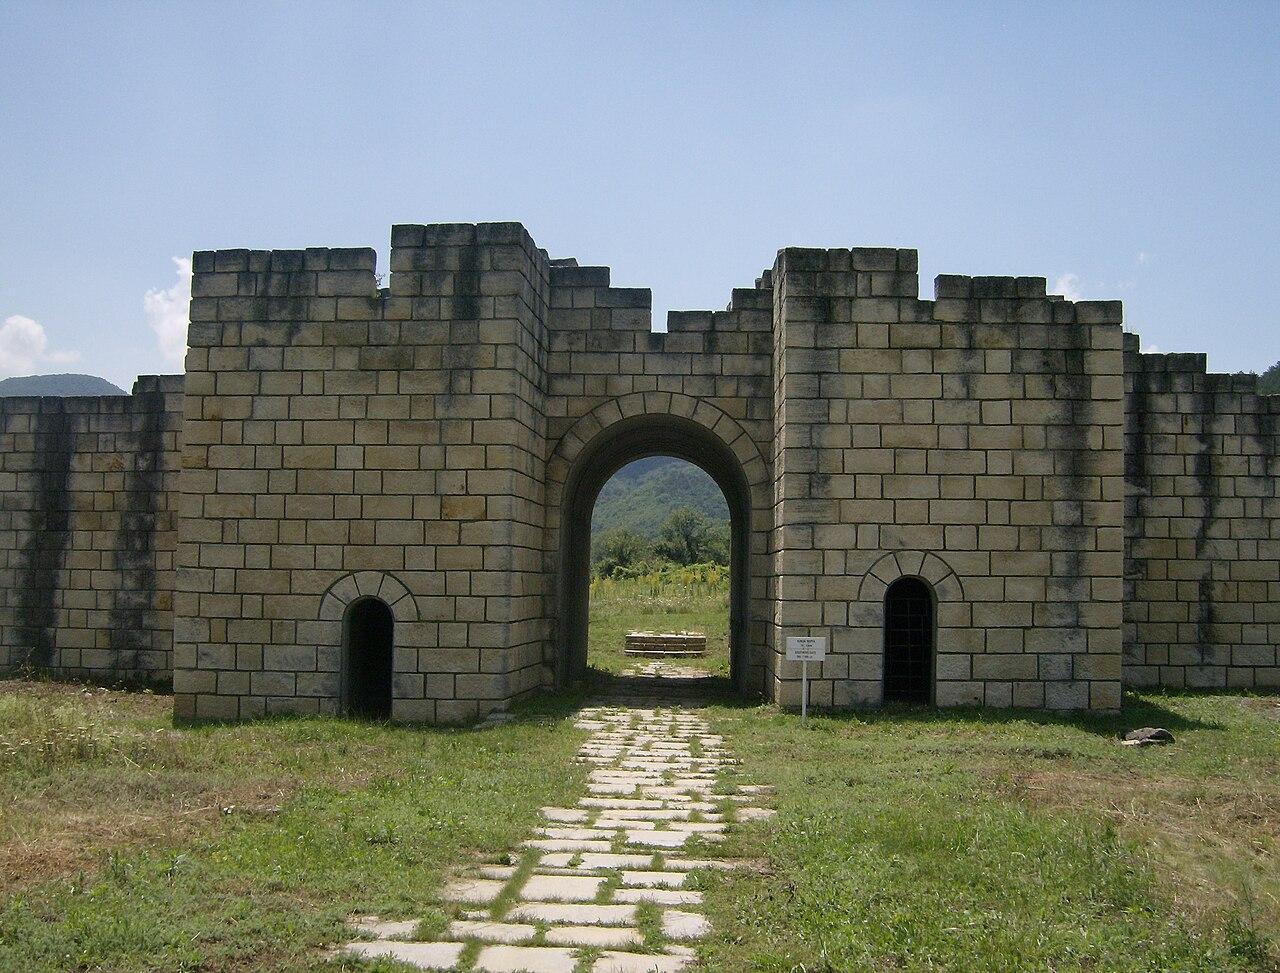 Bugarska - Page 2 1280px-Preslav_fortress_11